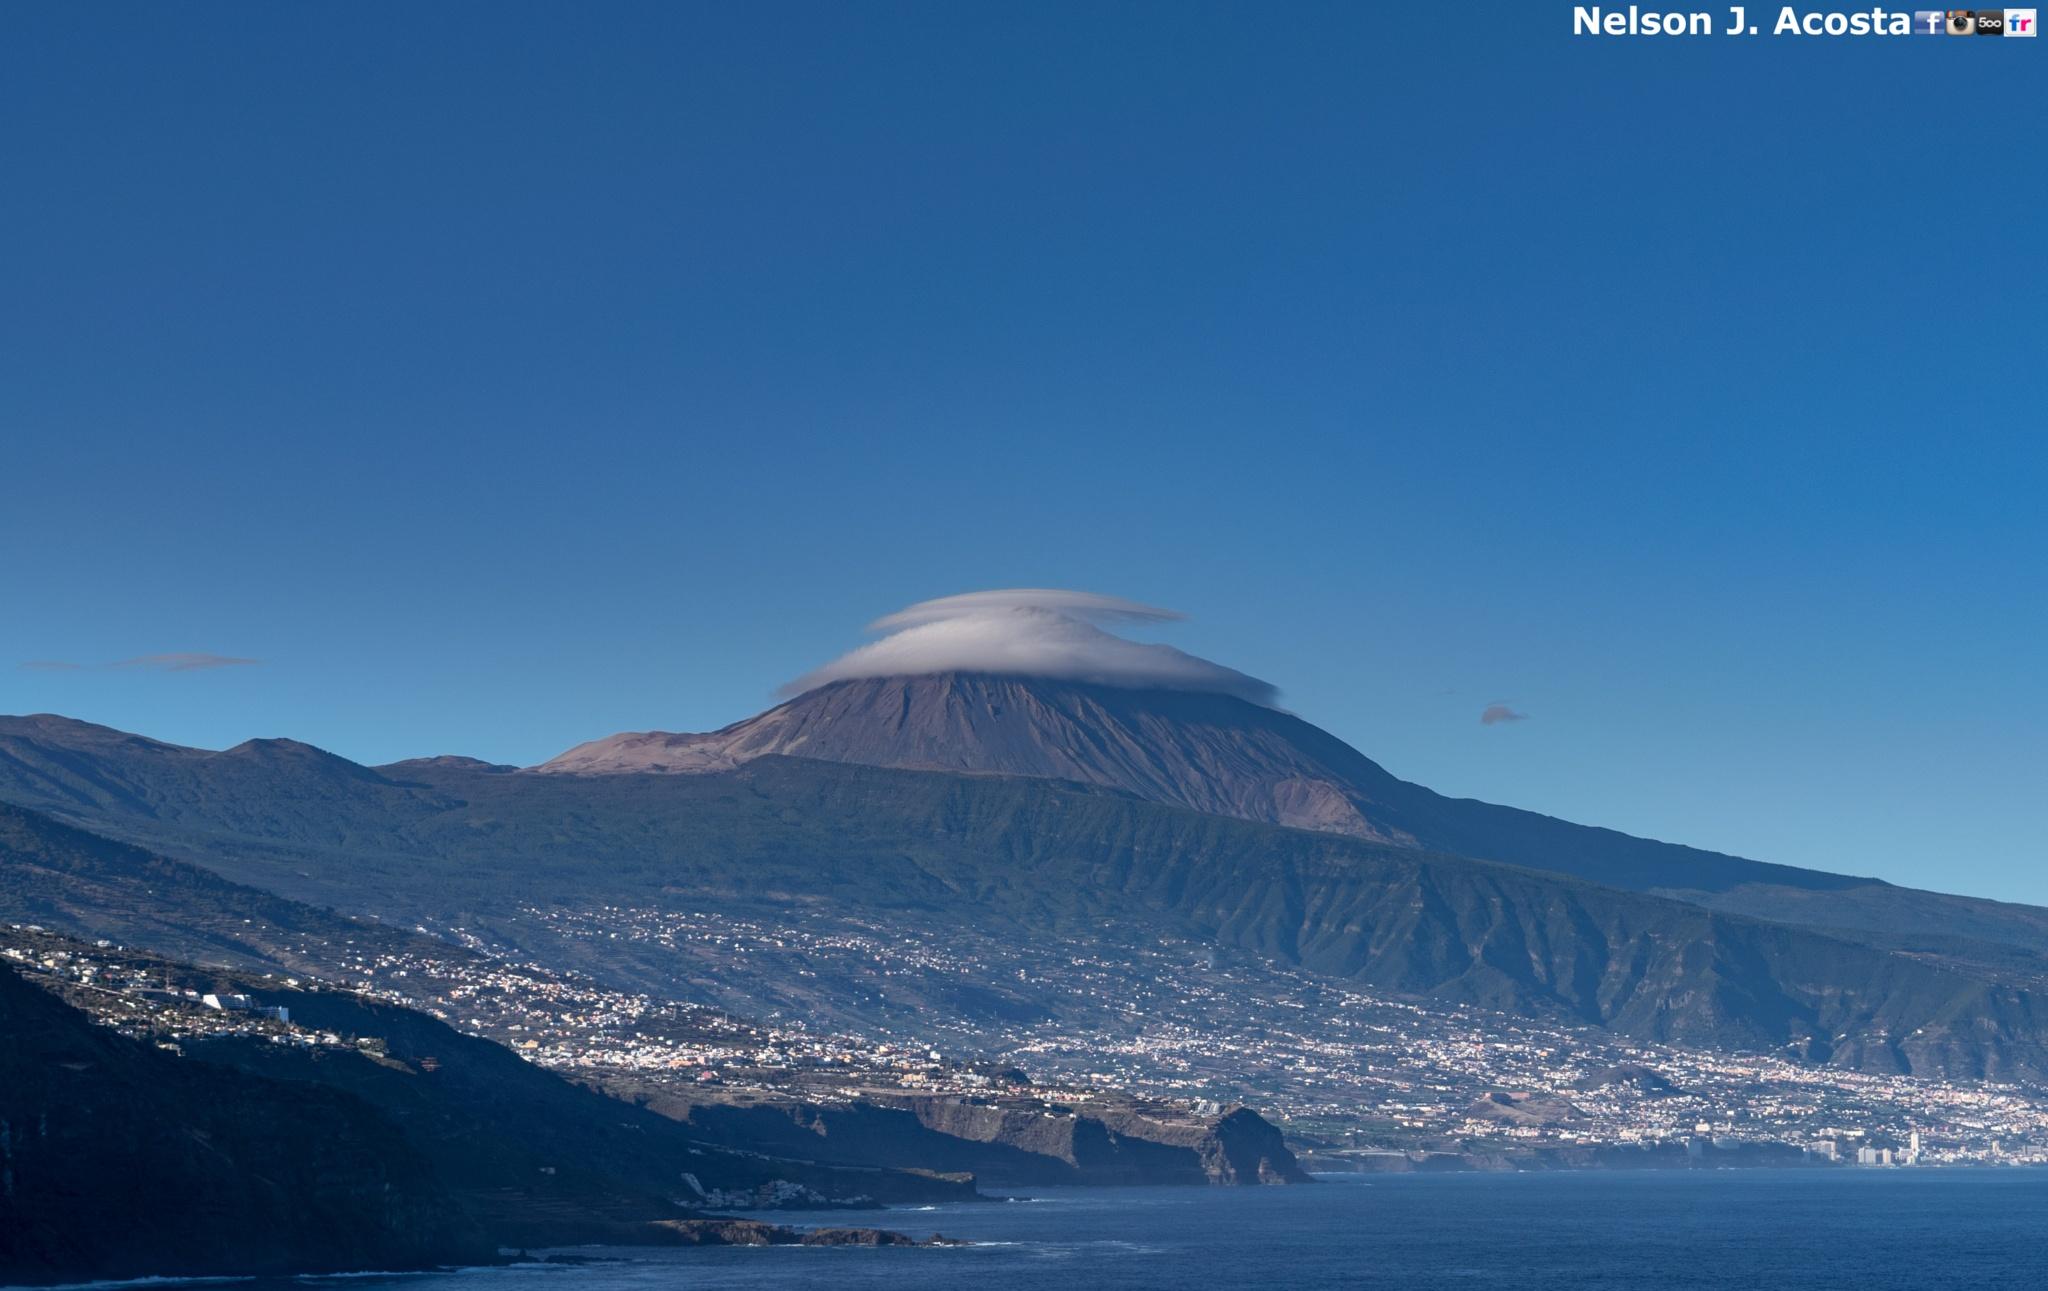 Doble sombrero en el Teide by Nelson J. Acosta